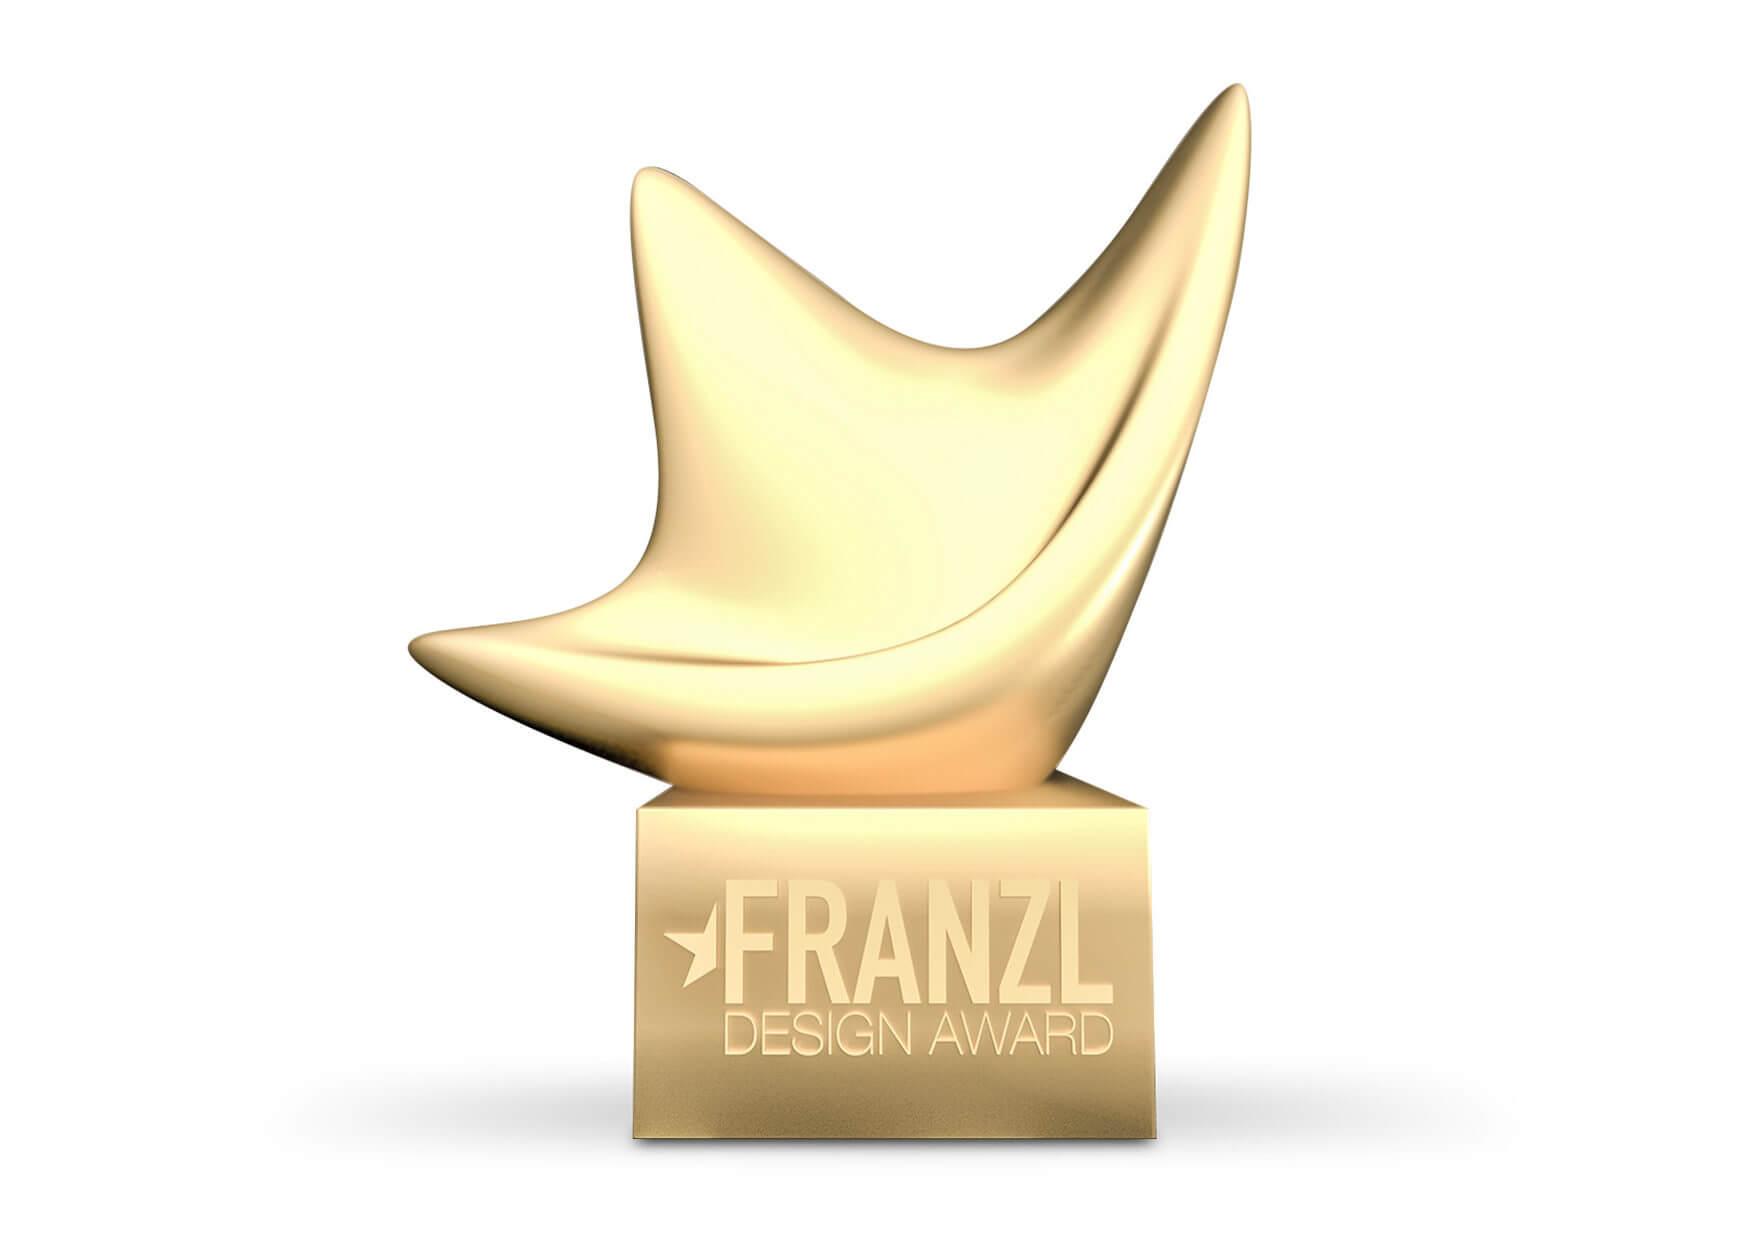 Franzl Design Award - Jungdesigner 2018 Kategorie Druckprodukt